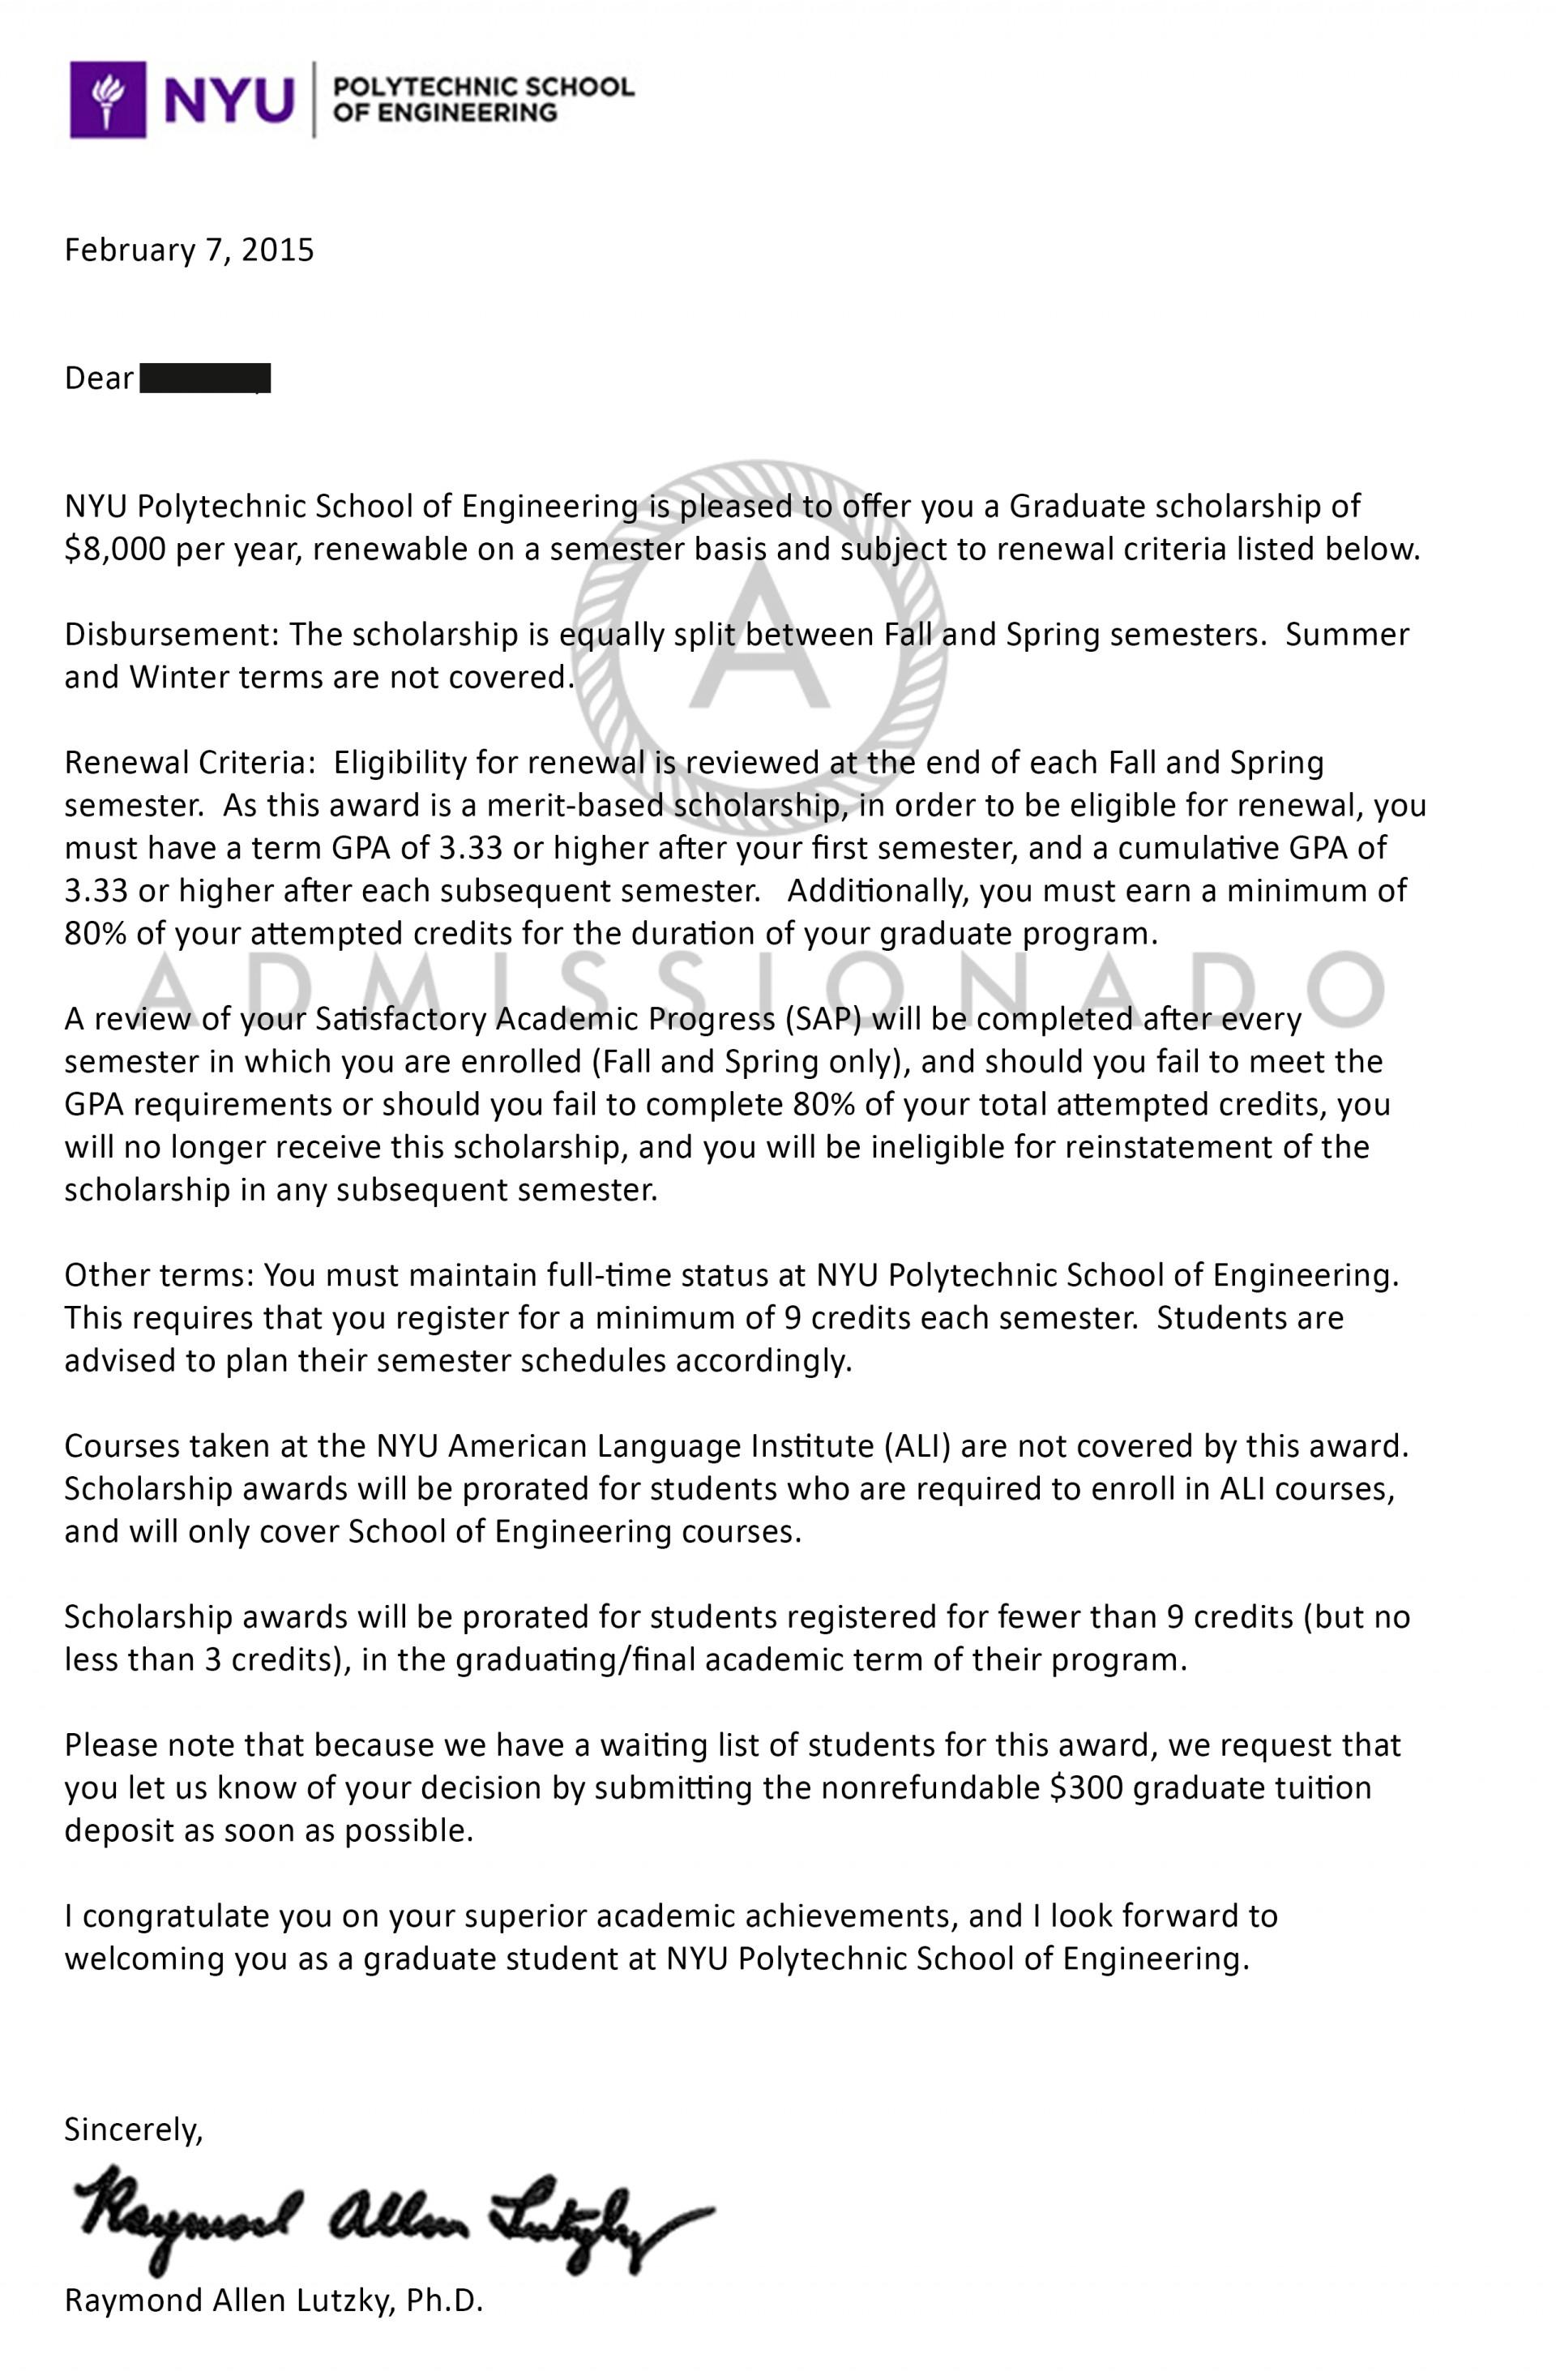 019 Nyu Essay Prompt Example Xz Acceptance Wondrous Prompts 2018 Undergraduate 1920